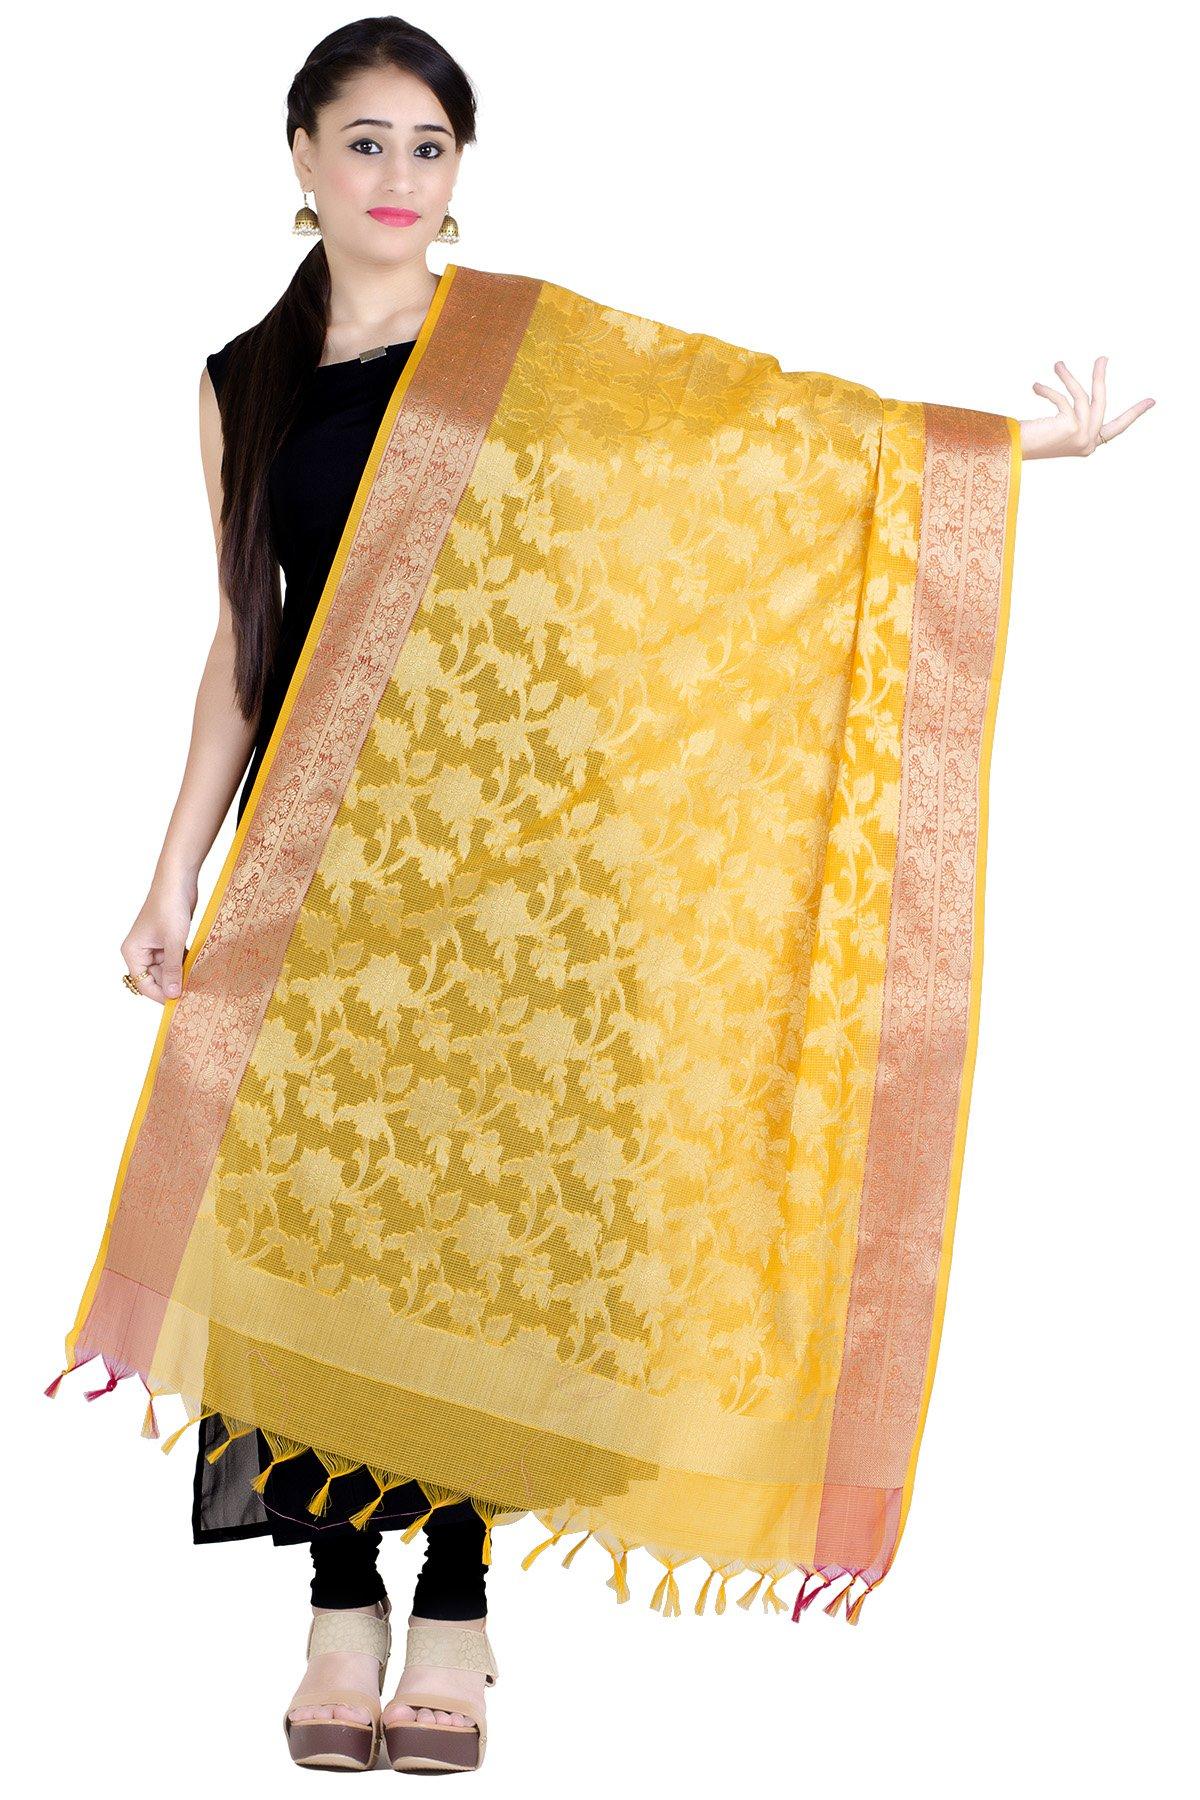 Chandrakala Women's Handwoven Zari Work Banarasi Dupatta Stole Scarf (Yellow)